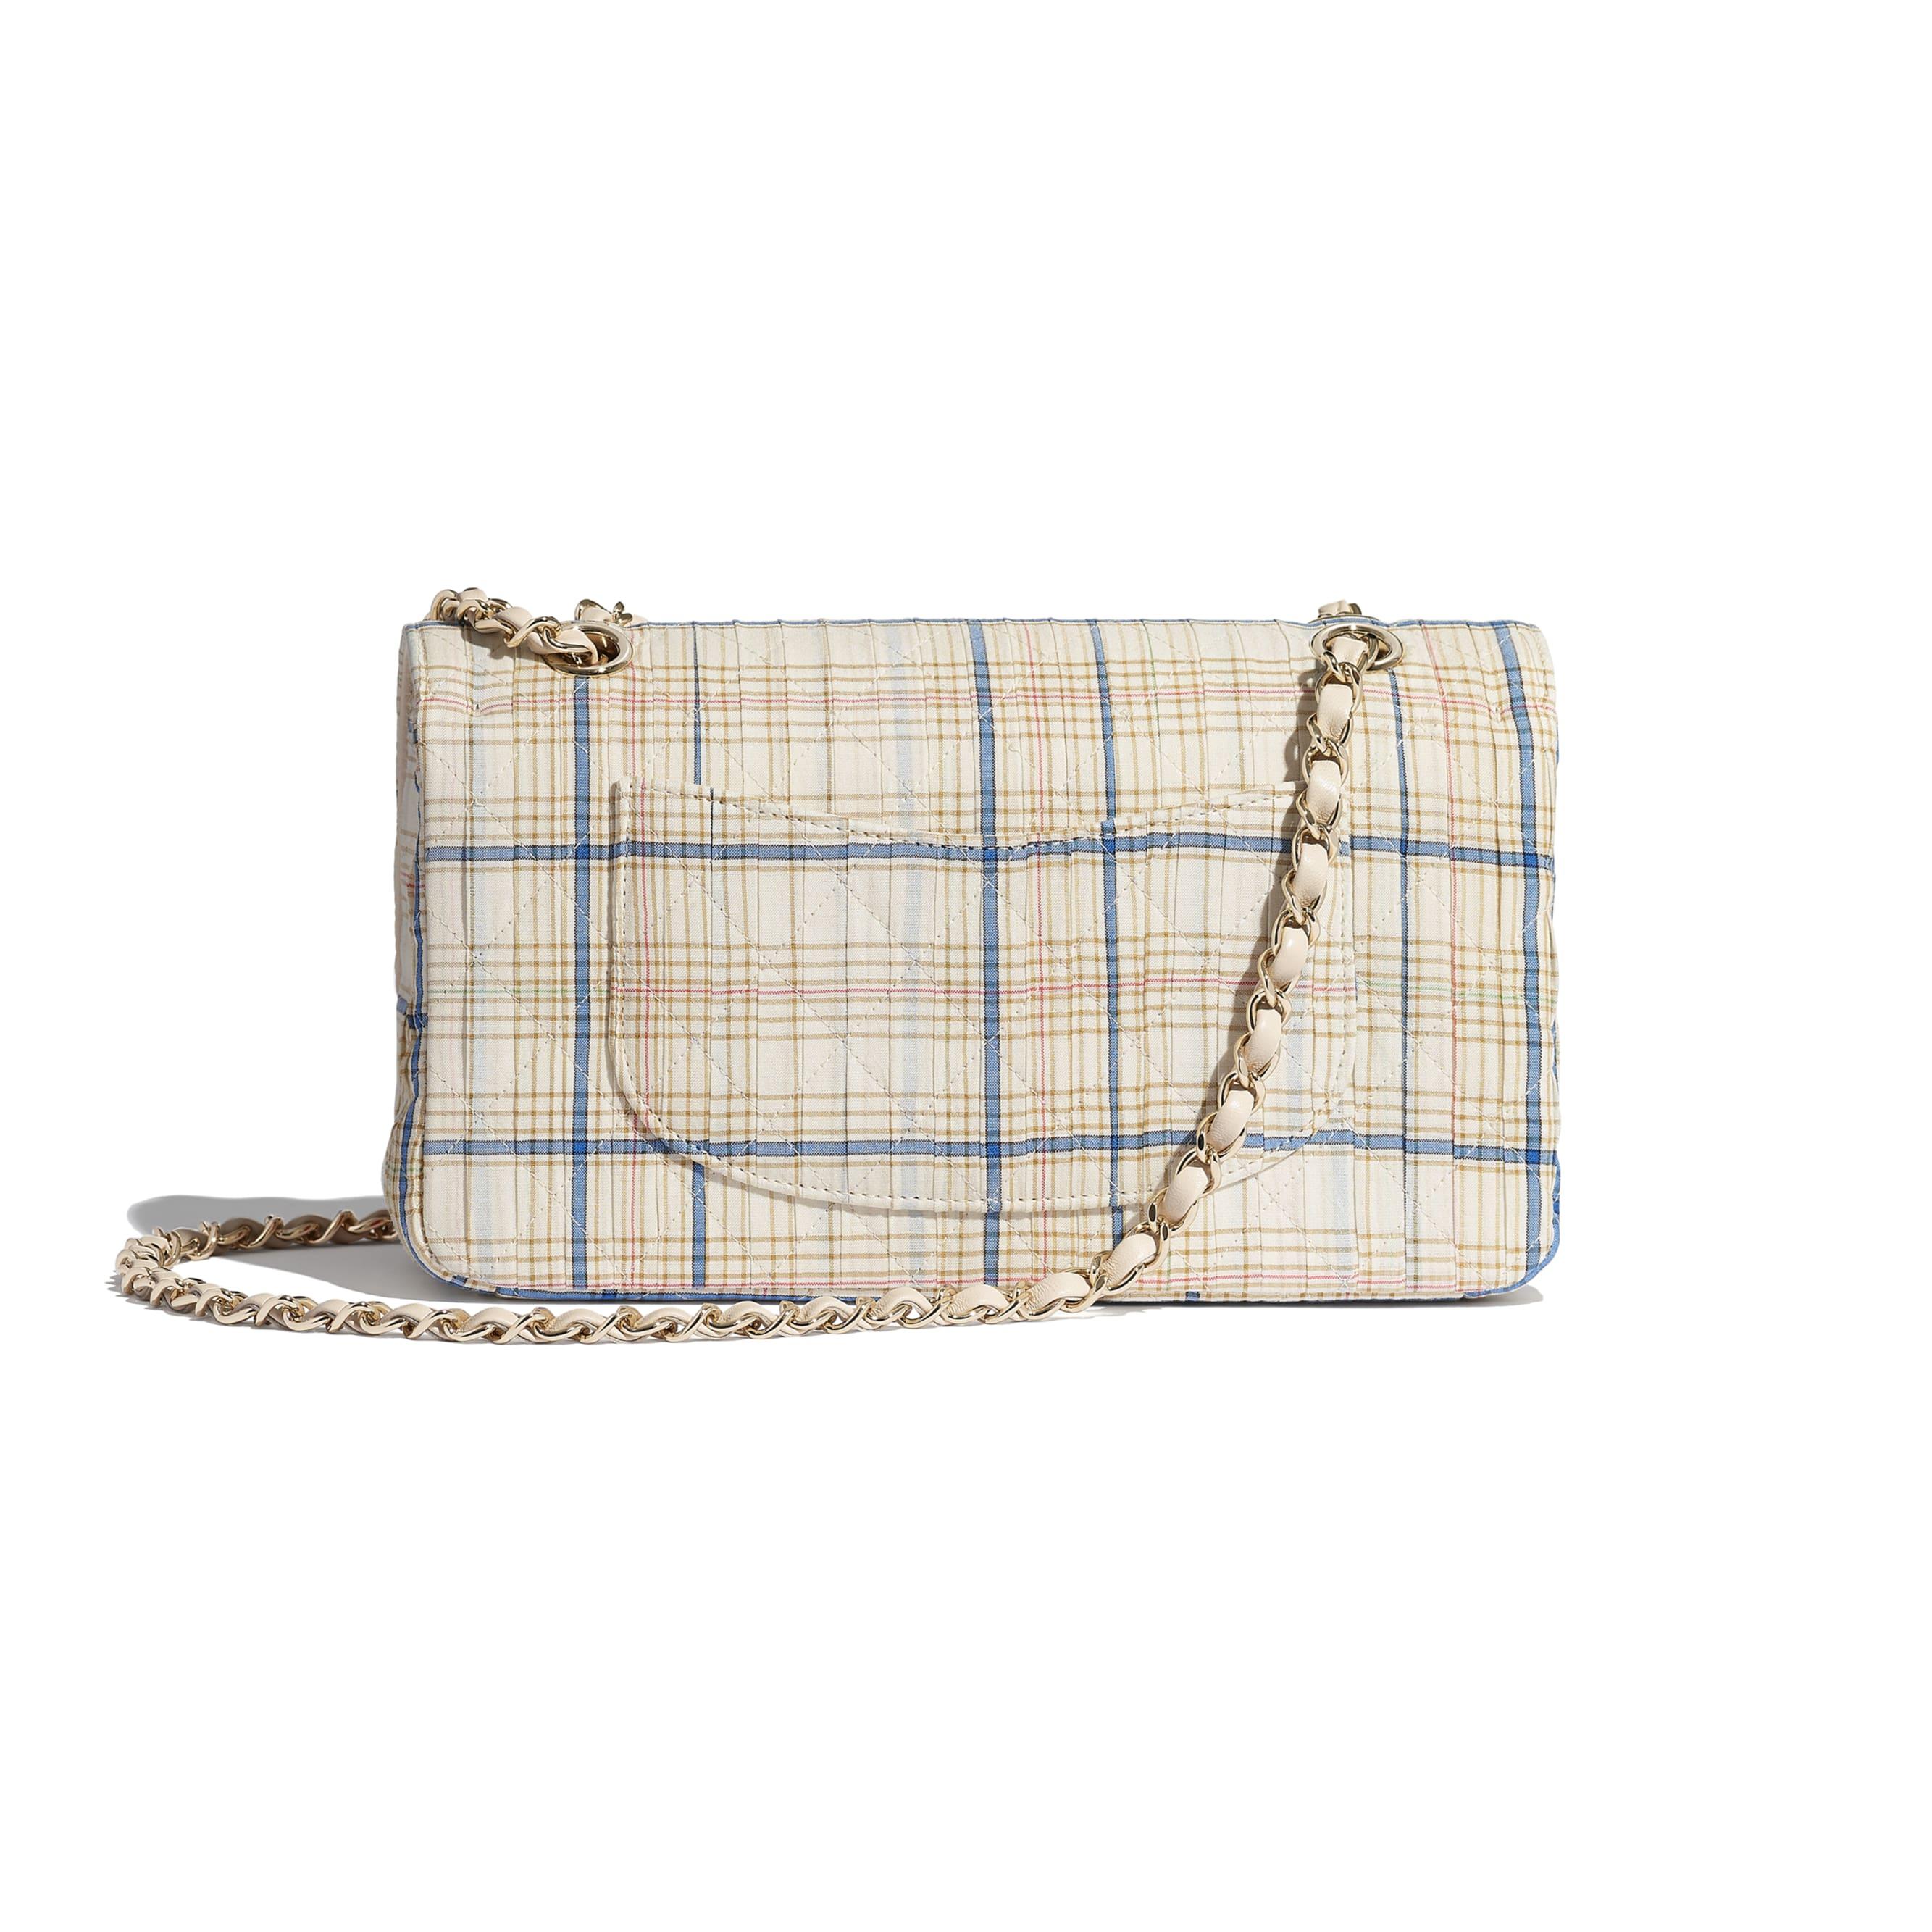 Classic Handbag - Ecru, Blue & Yellow - Cotton, Silk, Calfskin & Gold-Tone Metal - CHANEL - Alternative view - see standard sized version